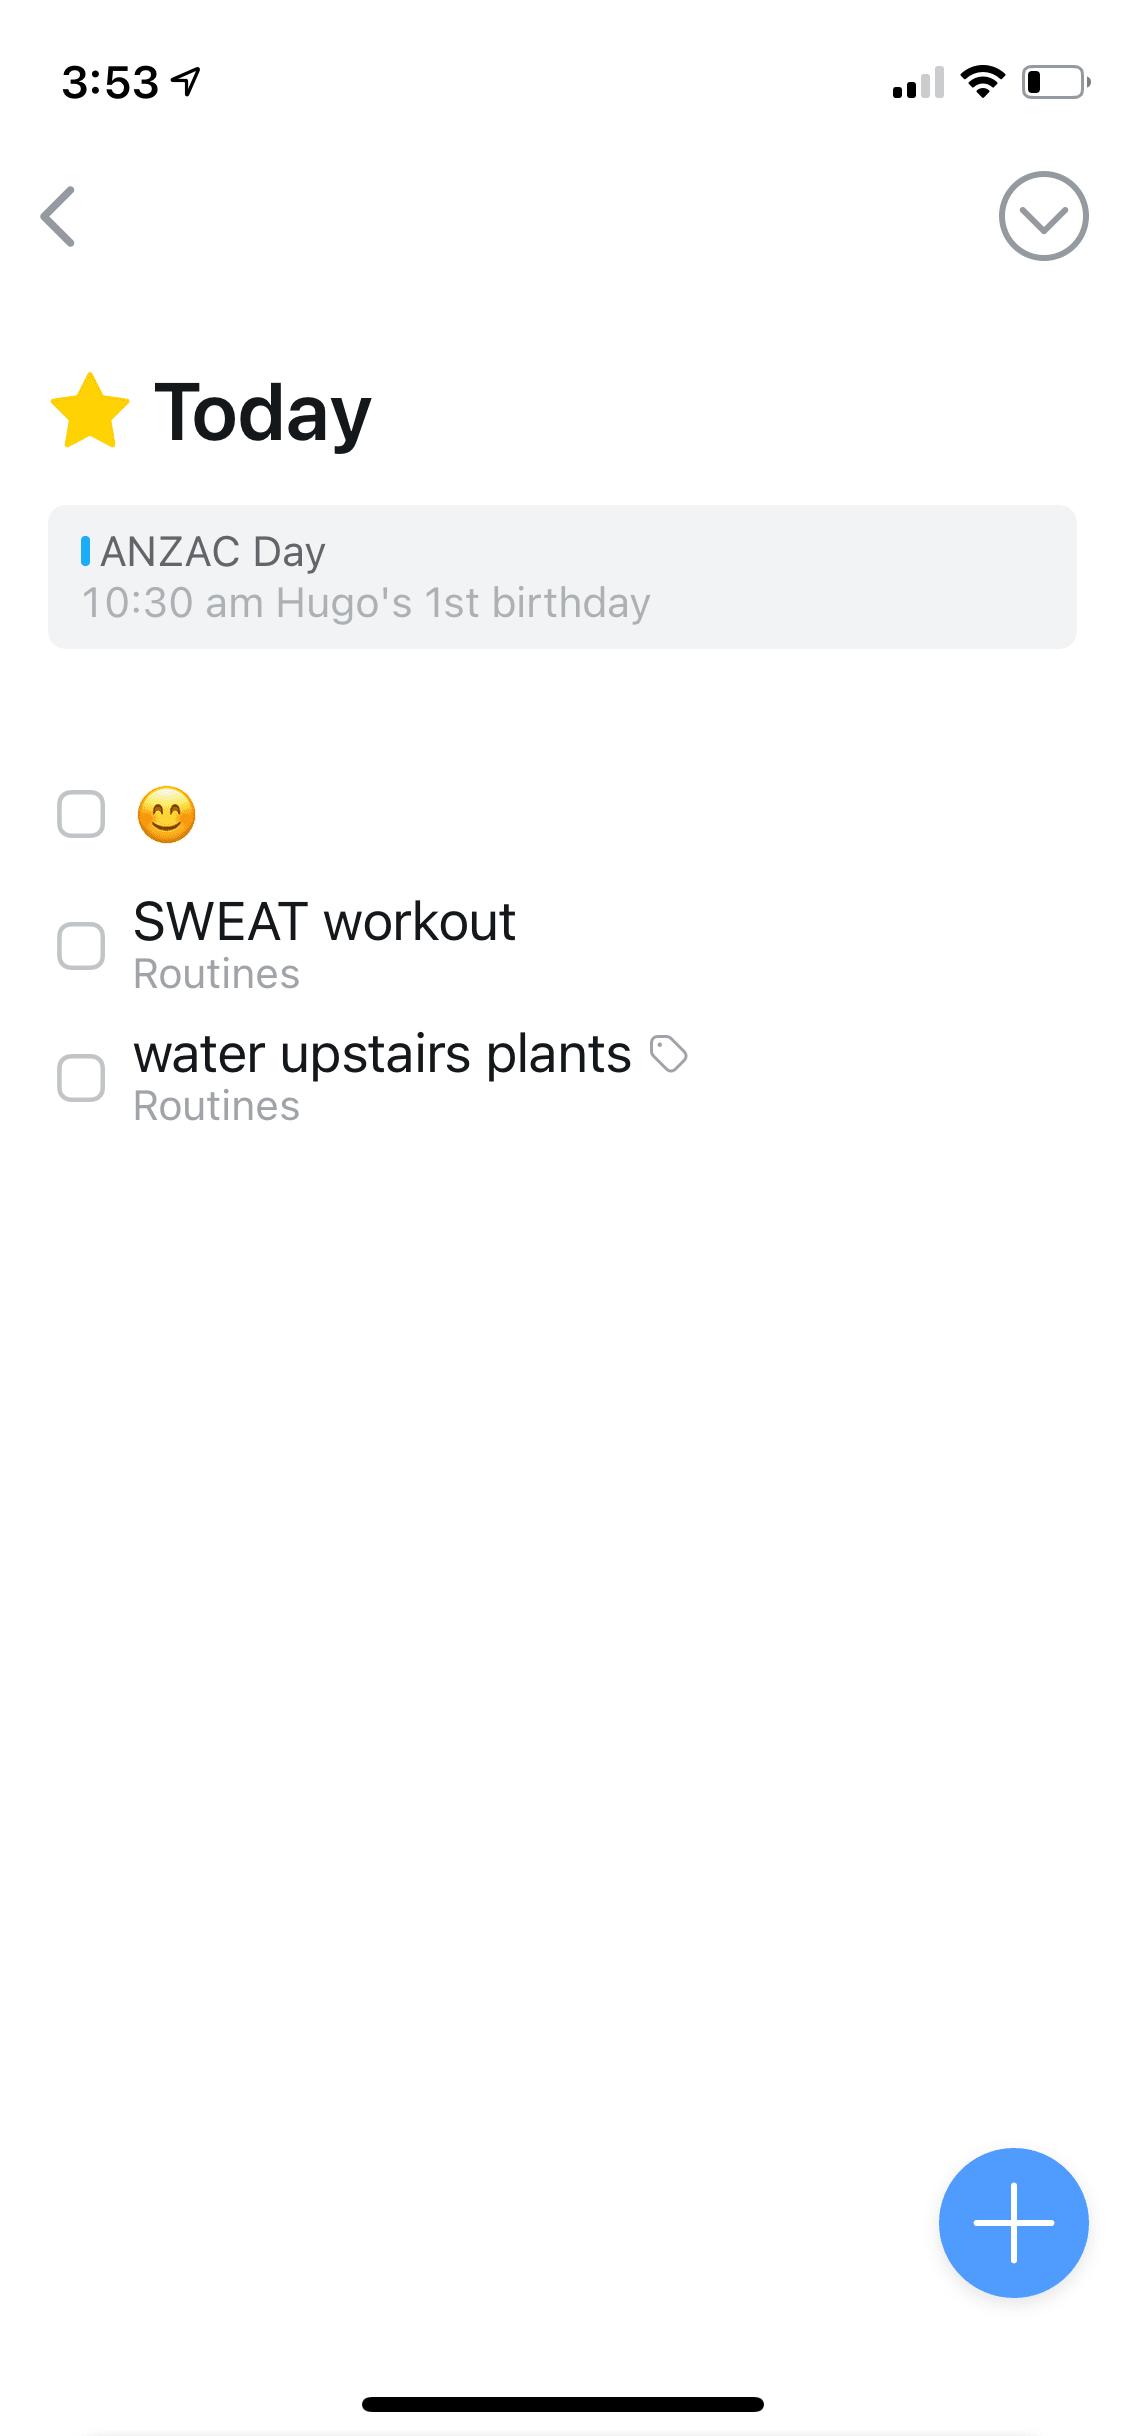 A screenshot of my todo list in Things